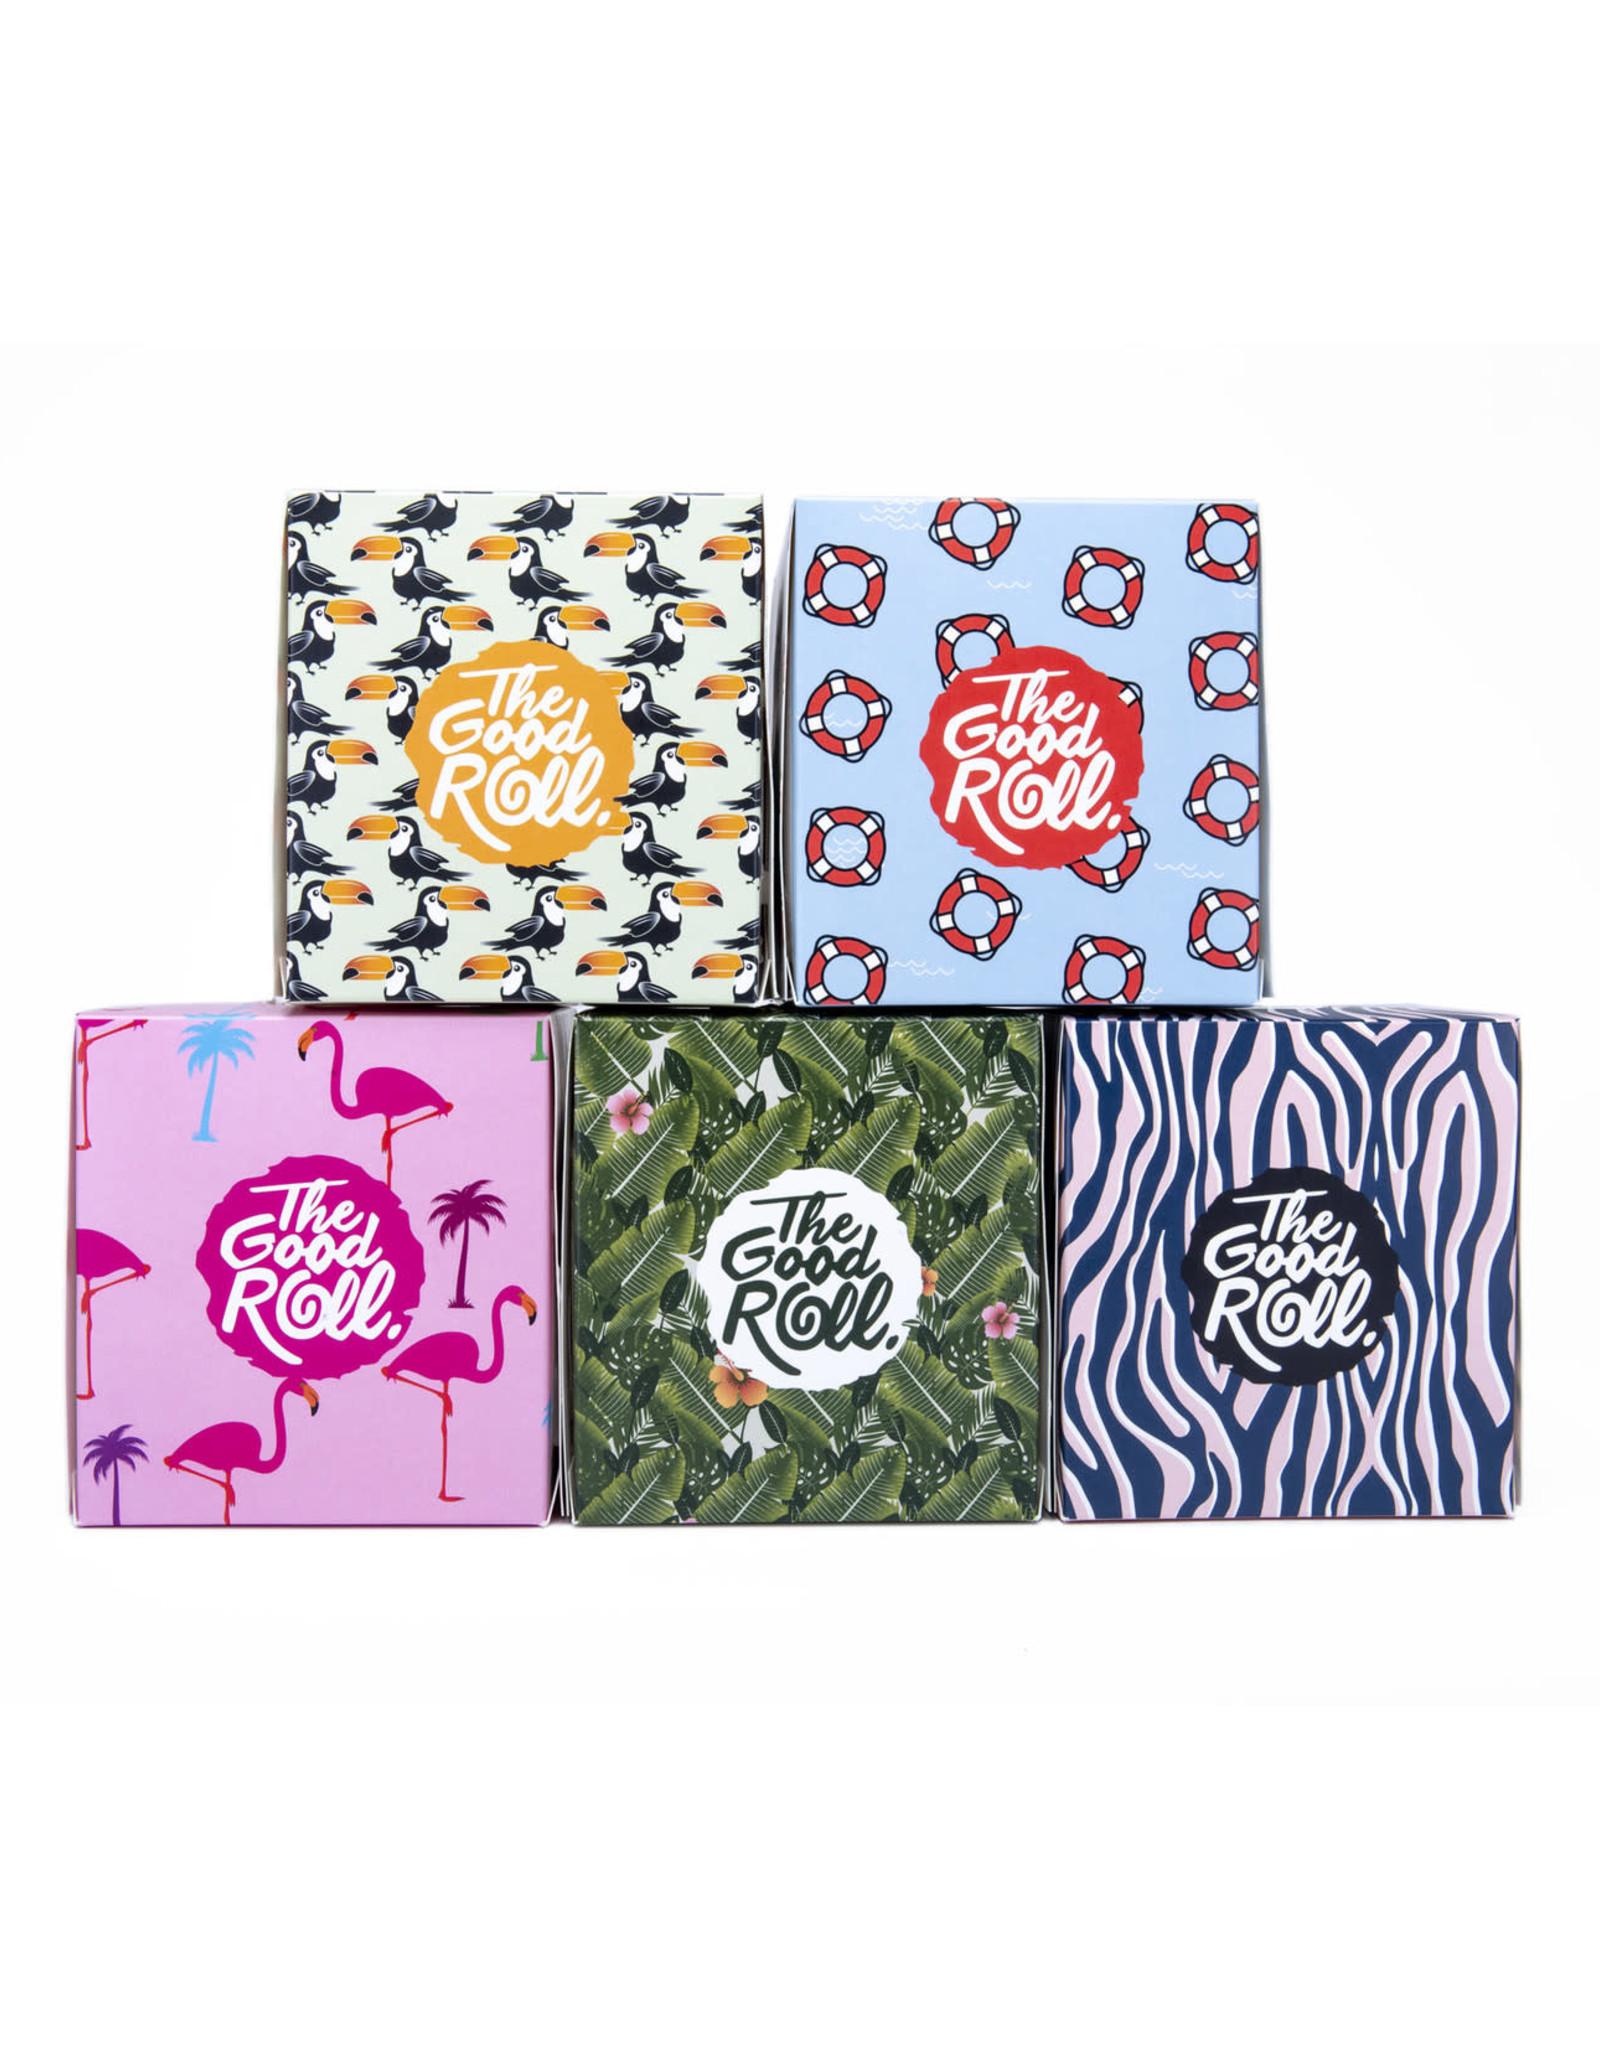 The good roll The Good Roll - box met 20 tissuedoosjes